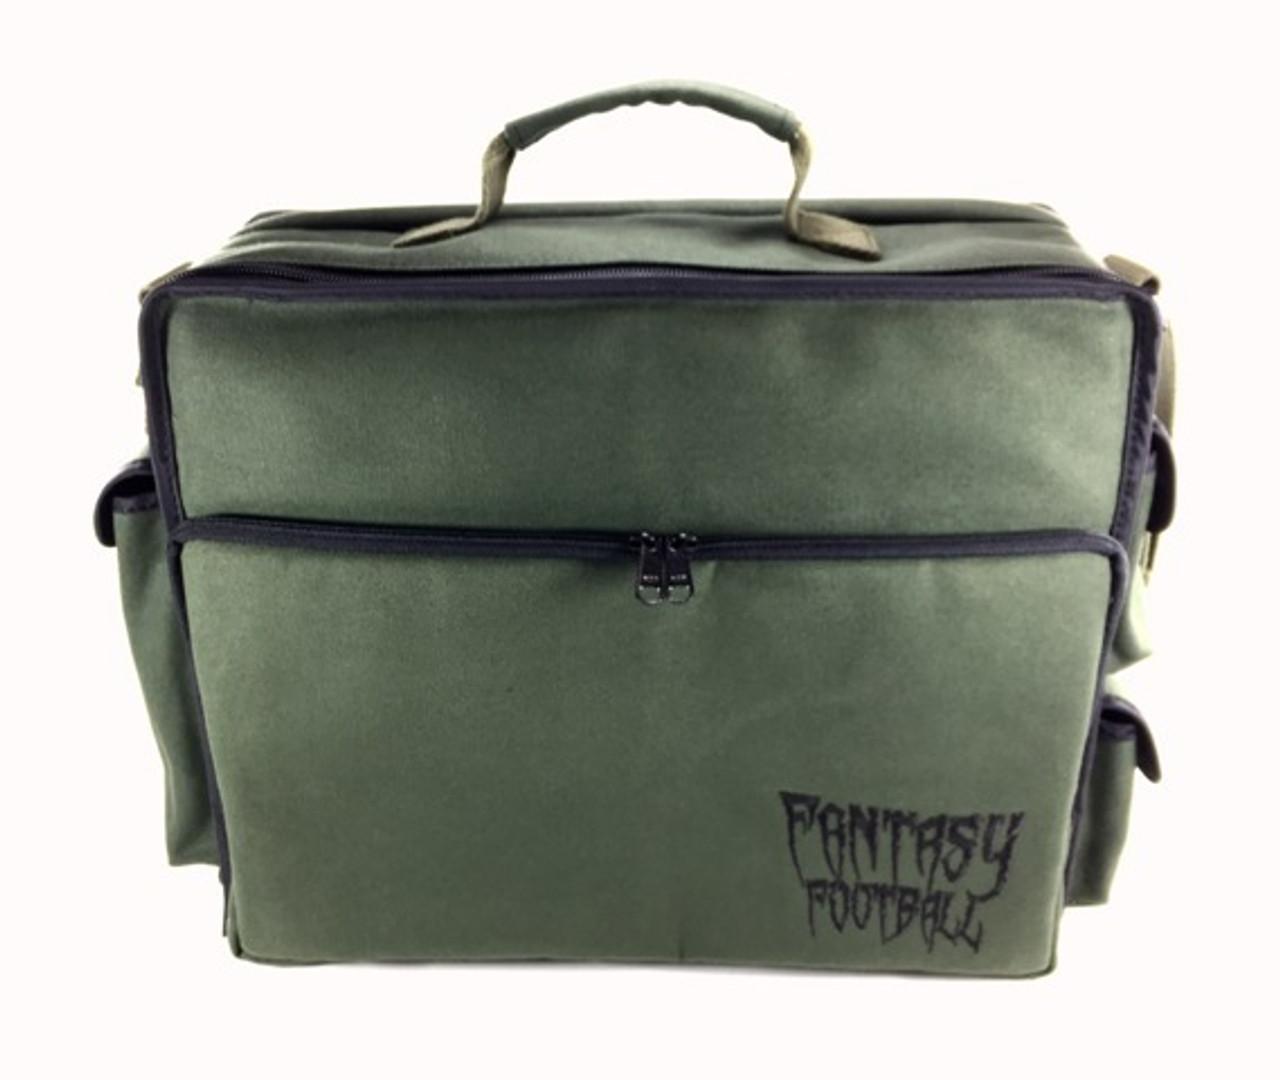 Fantasy Football Bag